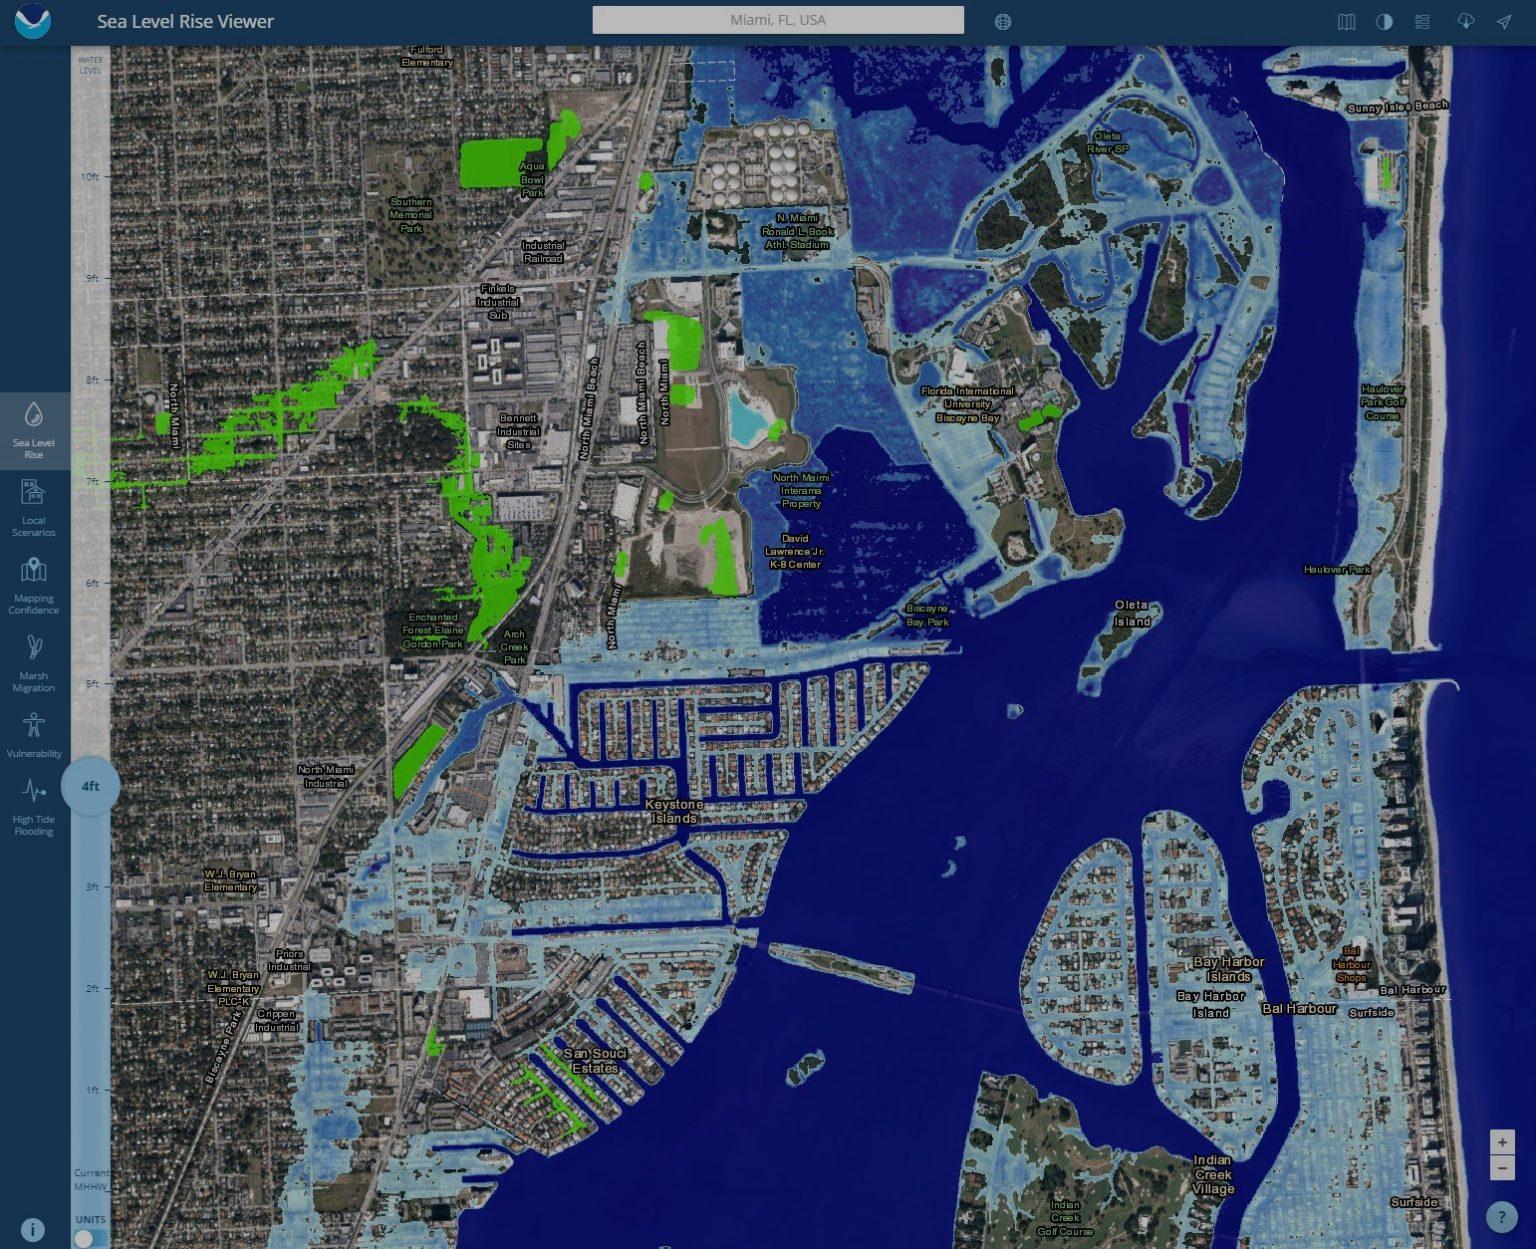 A topographical map of estimated sea level rise intrusion on the Miami area.